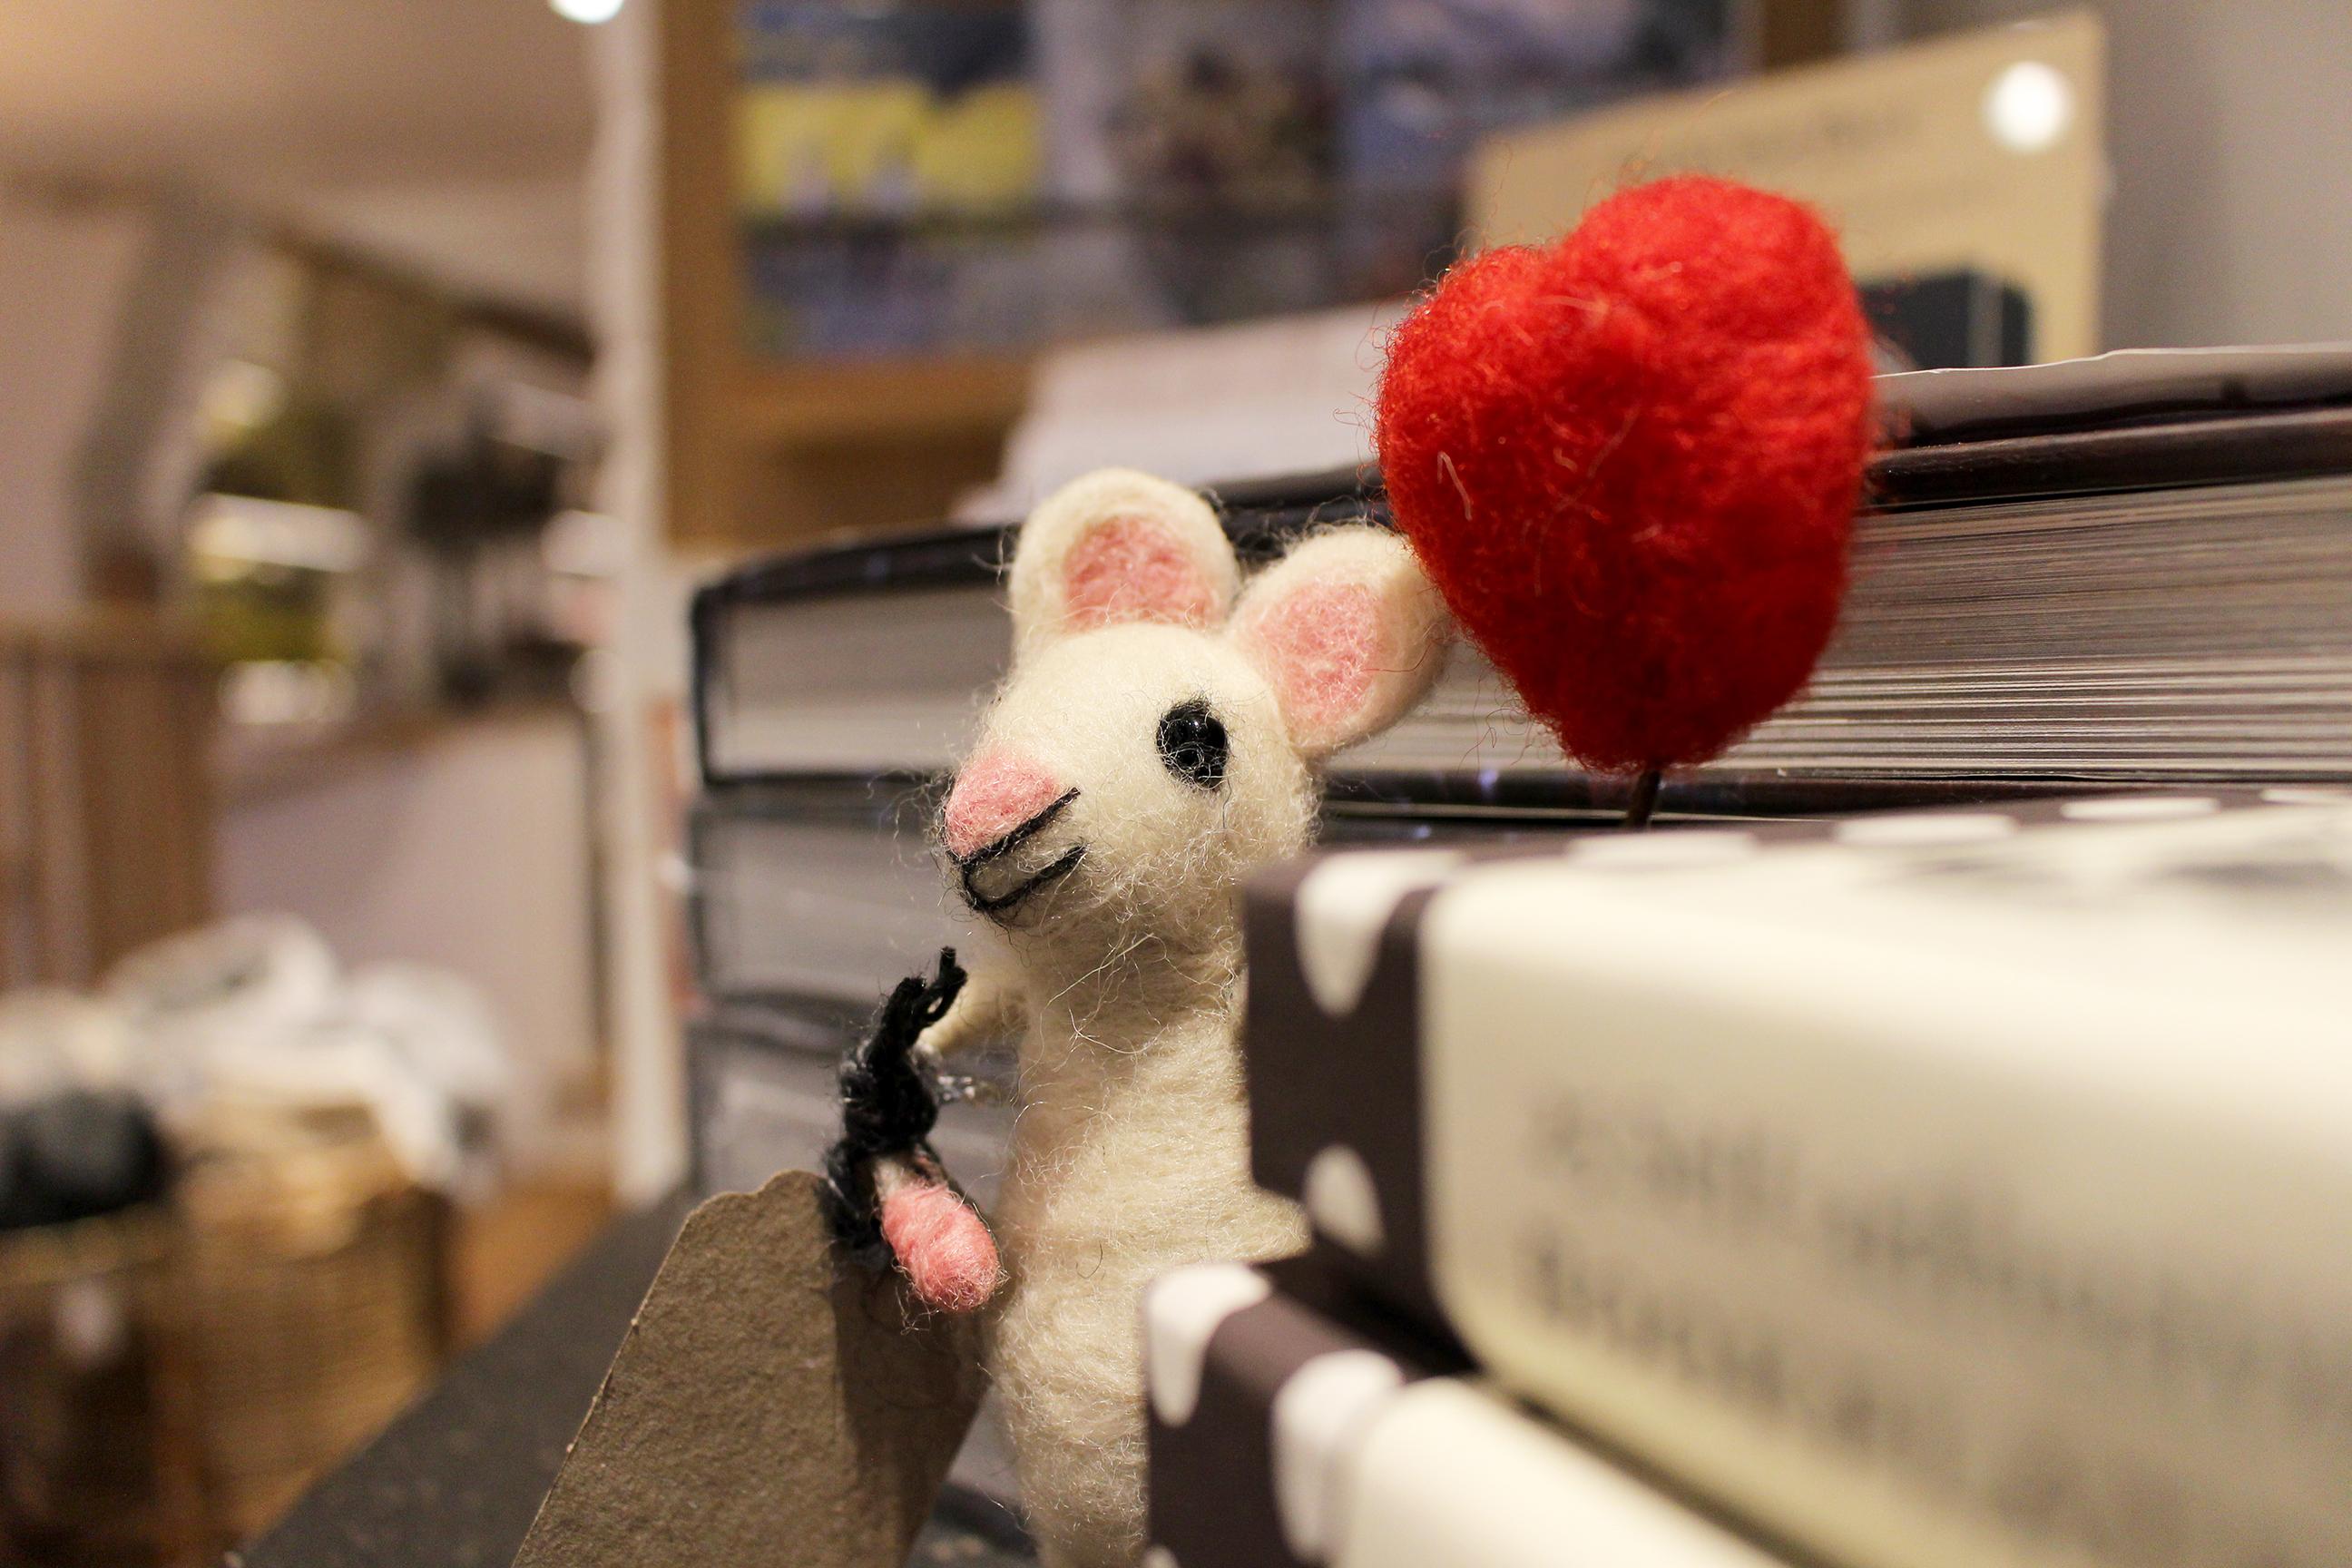 Happy Heart Mouse Balloon